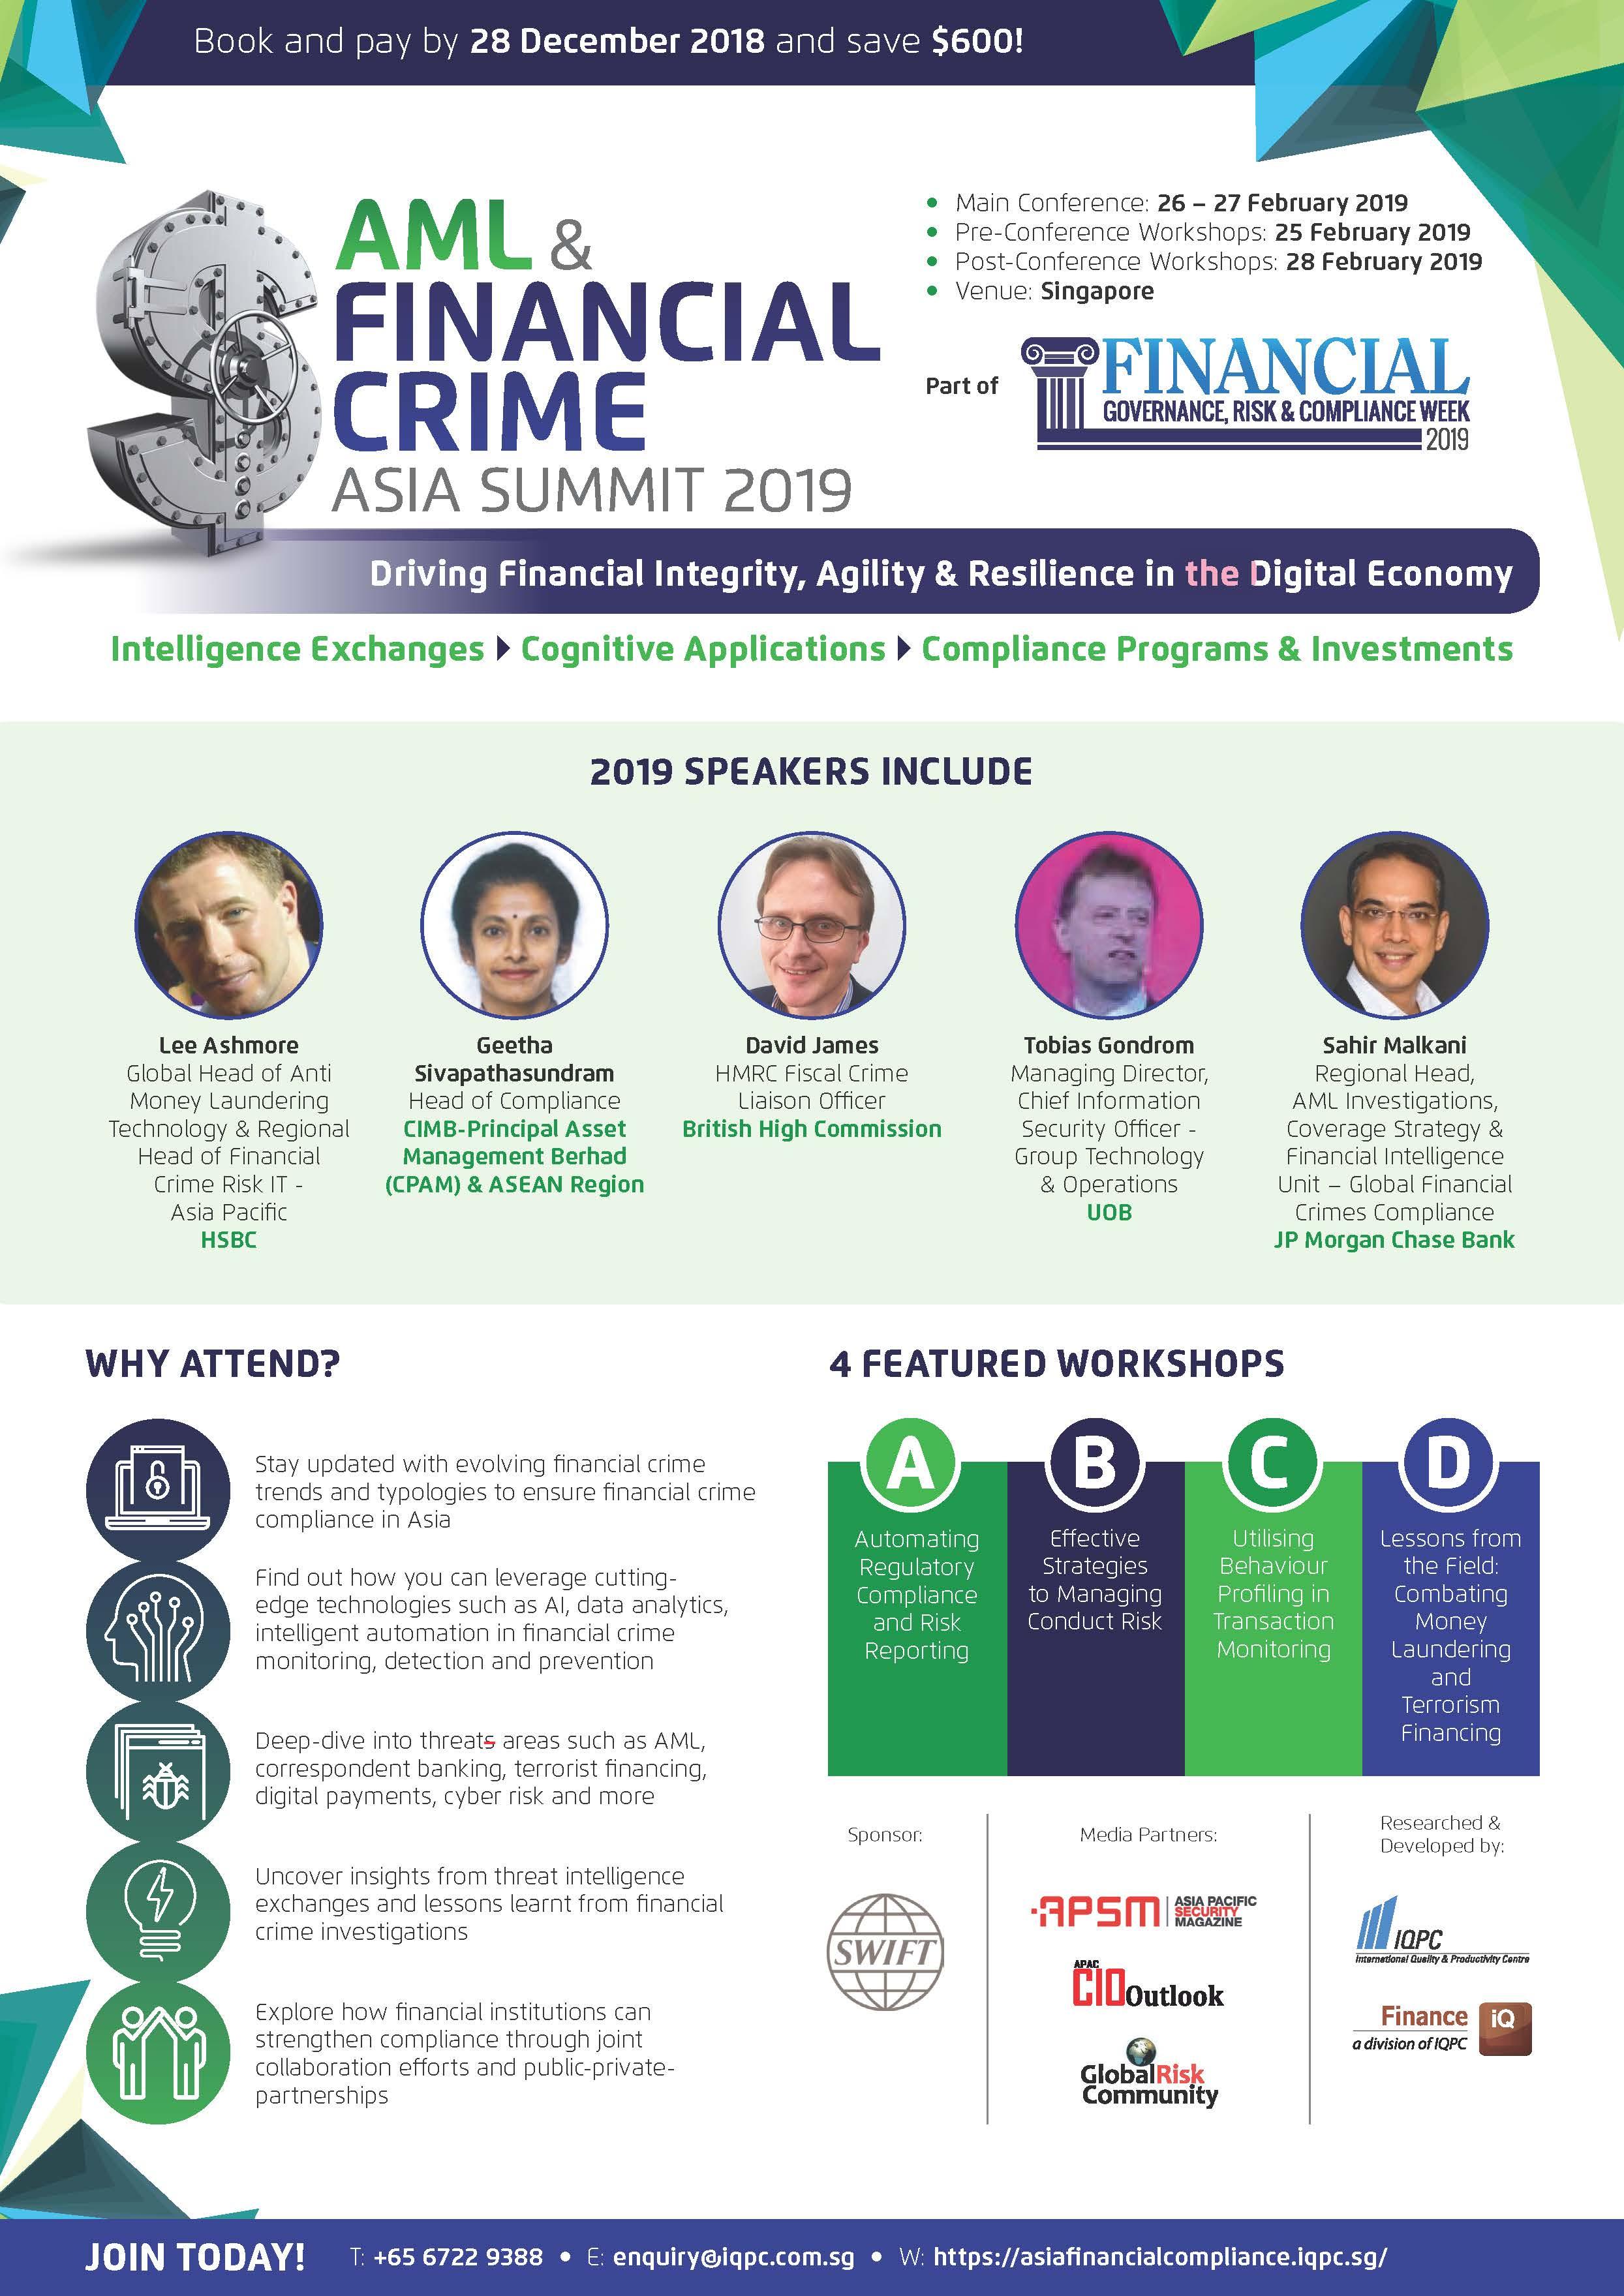 Financial Governance, Risk & Compliance Week Asia 2019 Brochure